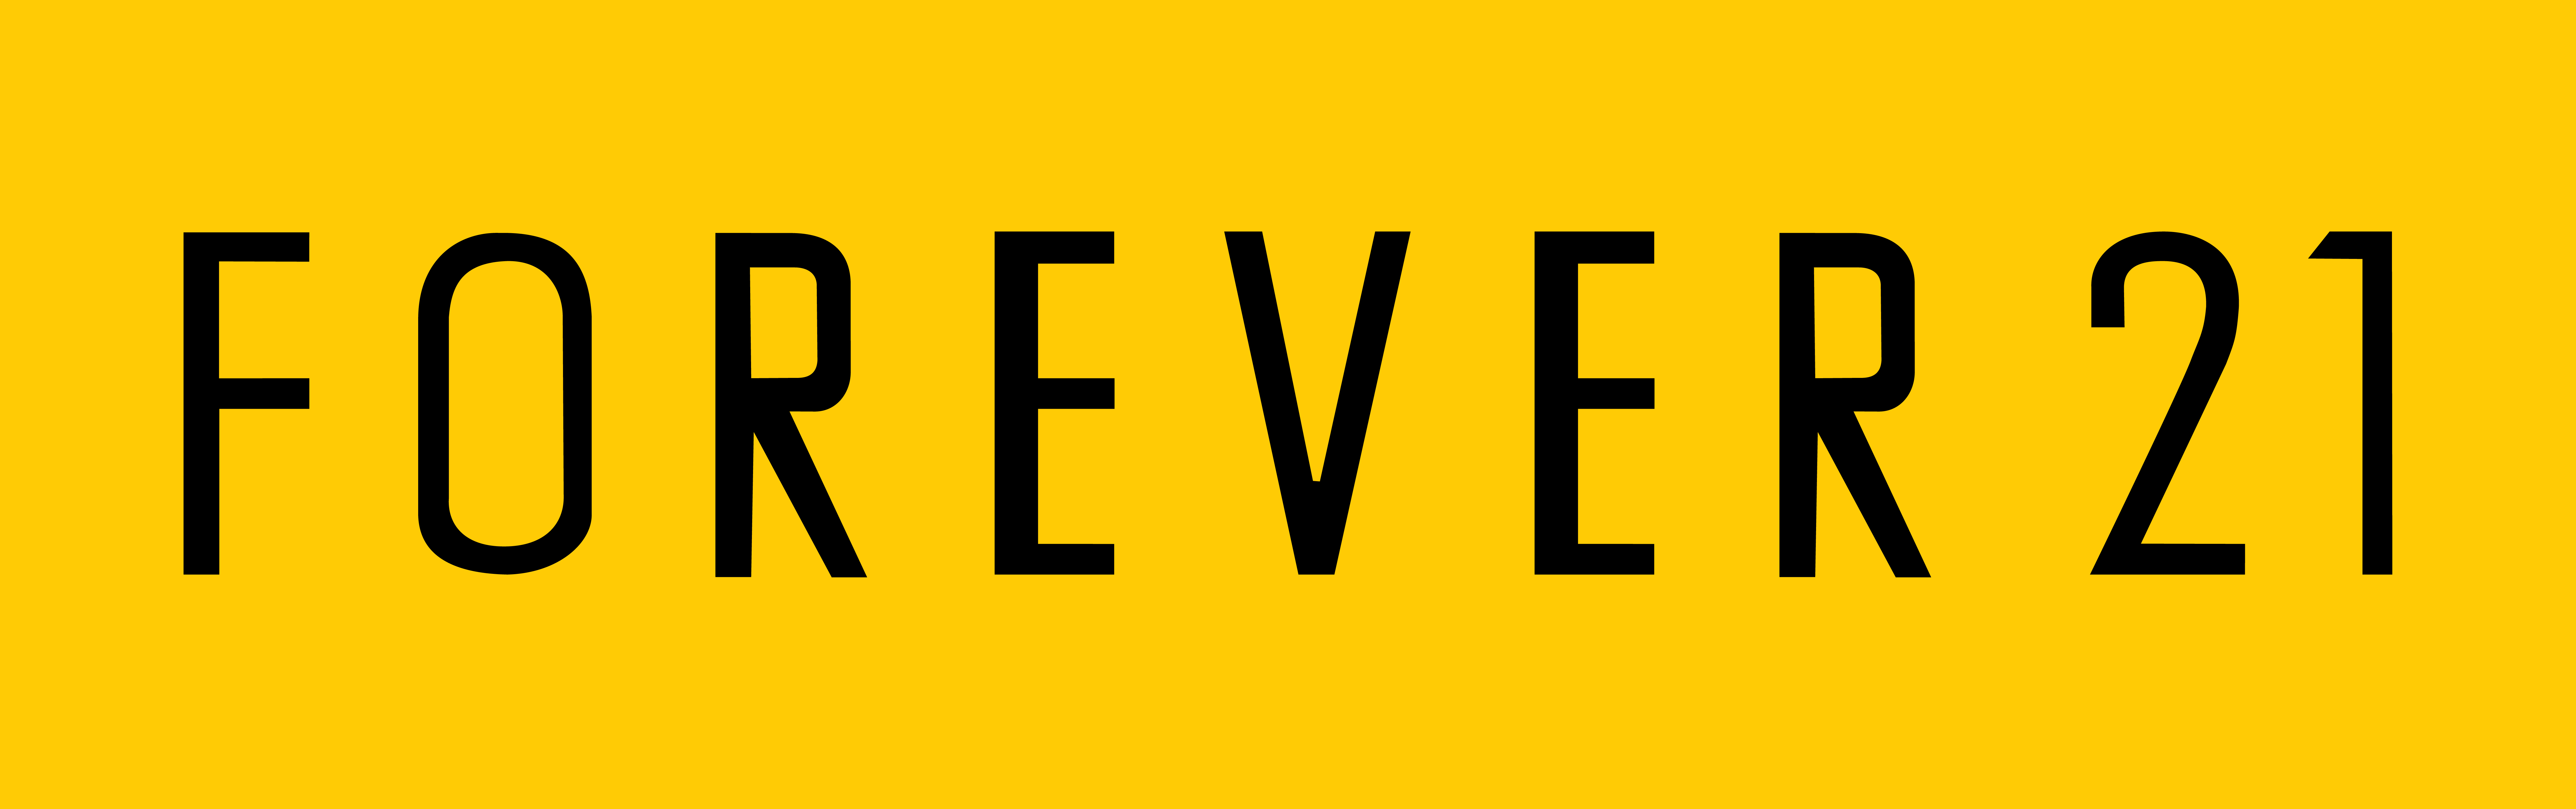 Forever 21 Logo PNG - 109084